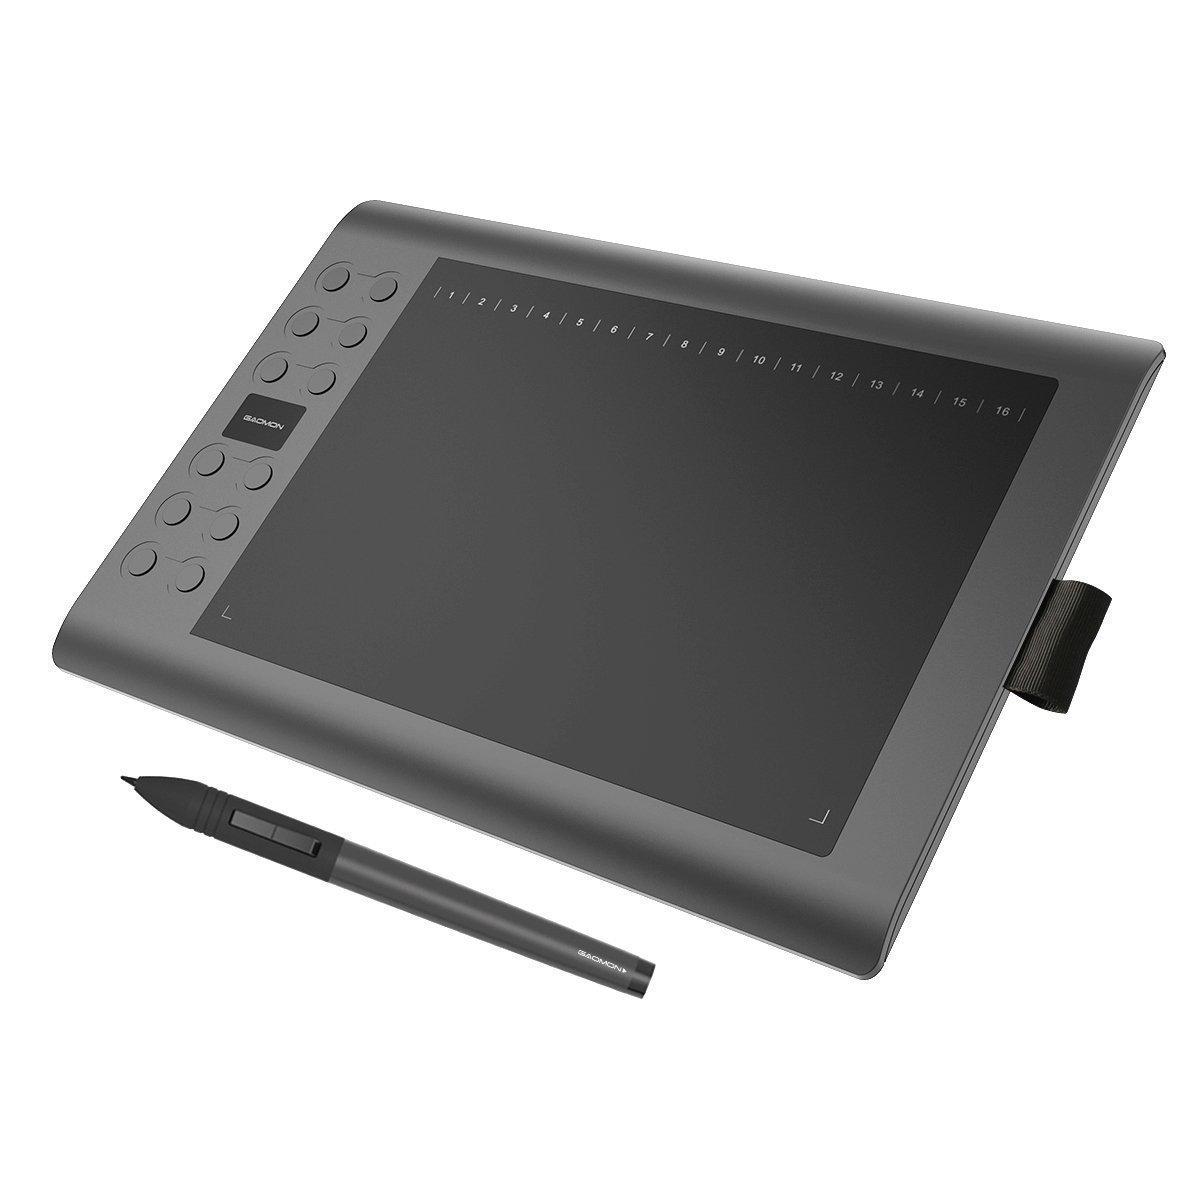 Tableta Digitalizadora Gaomon M106k 25.4x15.2cm 2048 Np